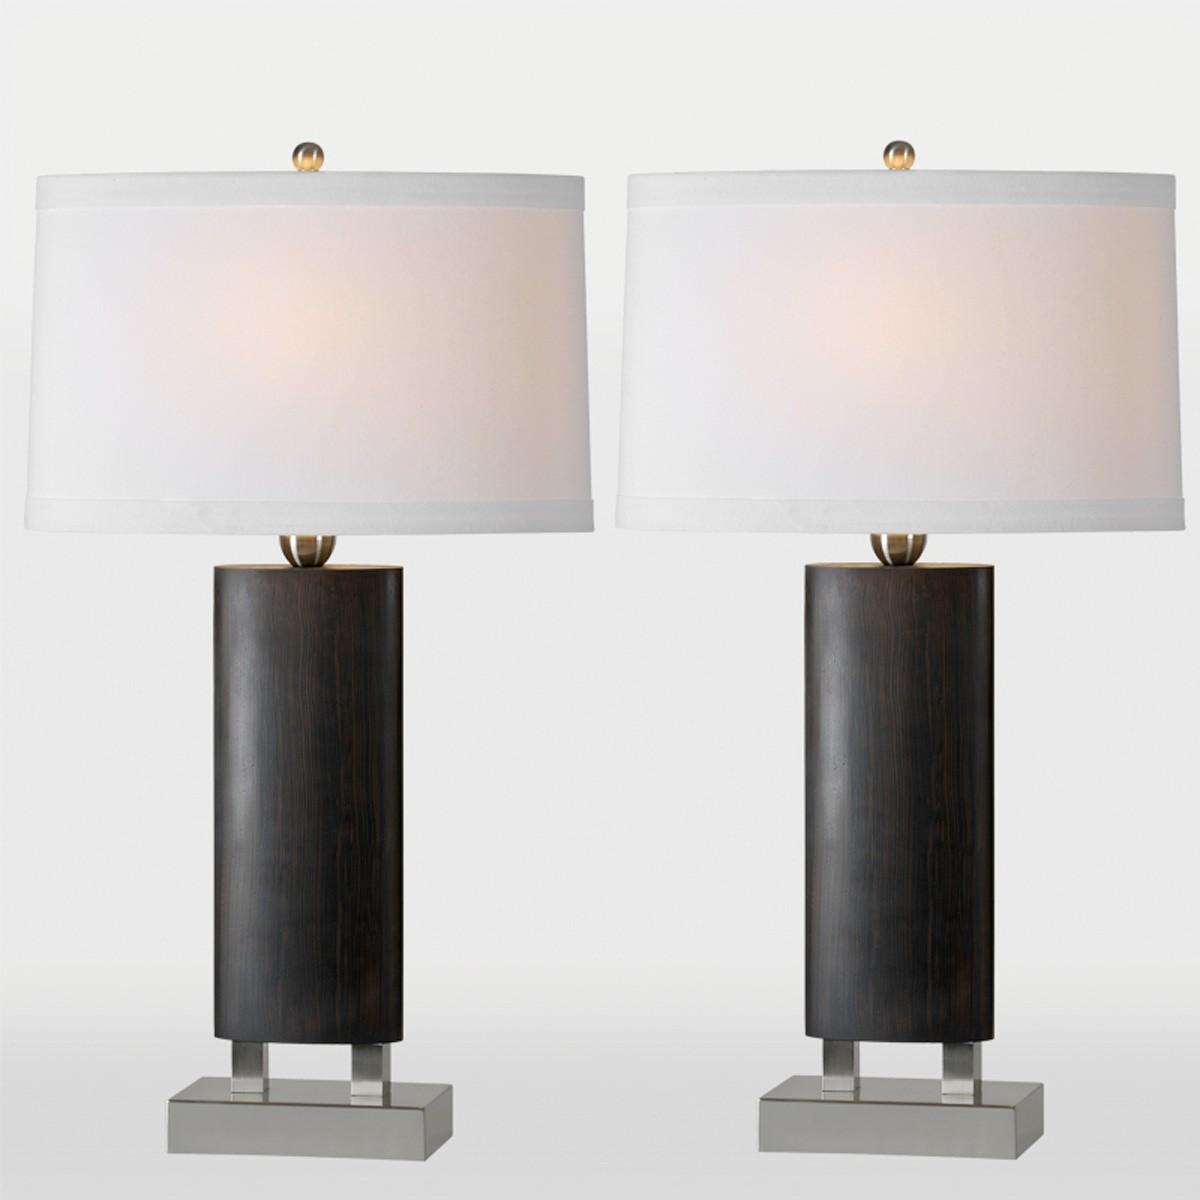 Ren-Wil Tilney Table Lamp Set - Walnut